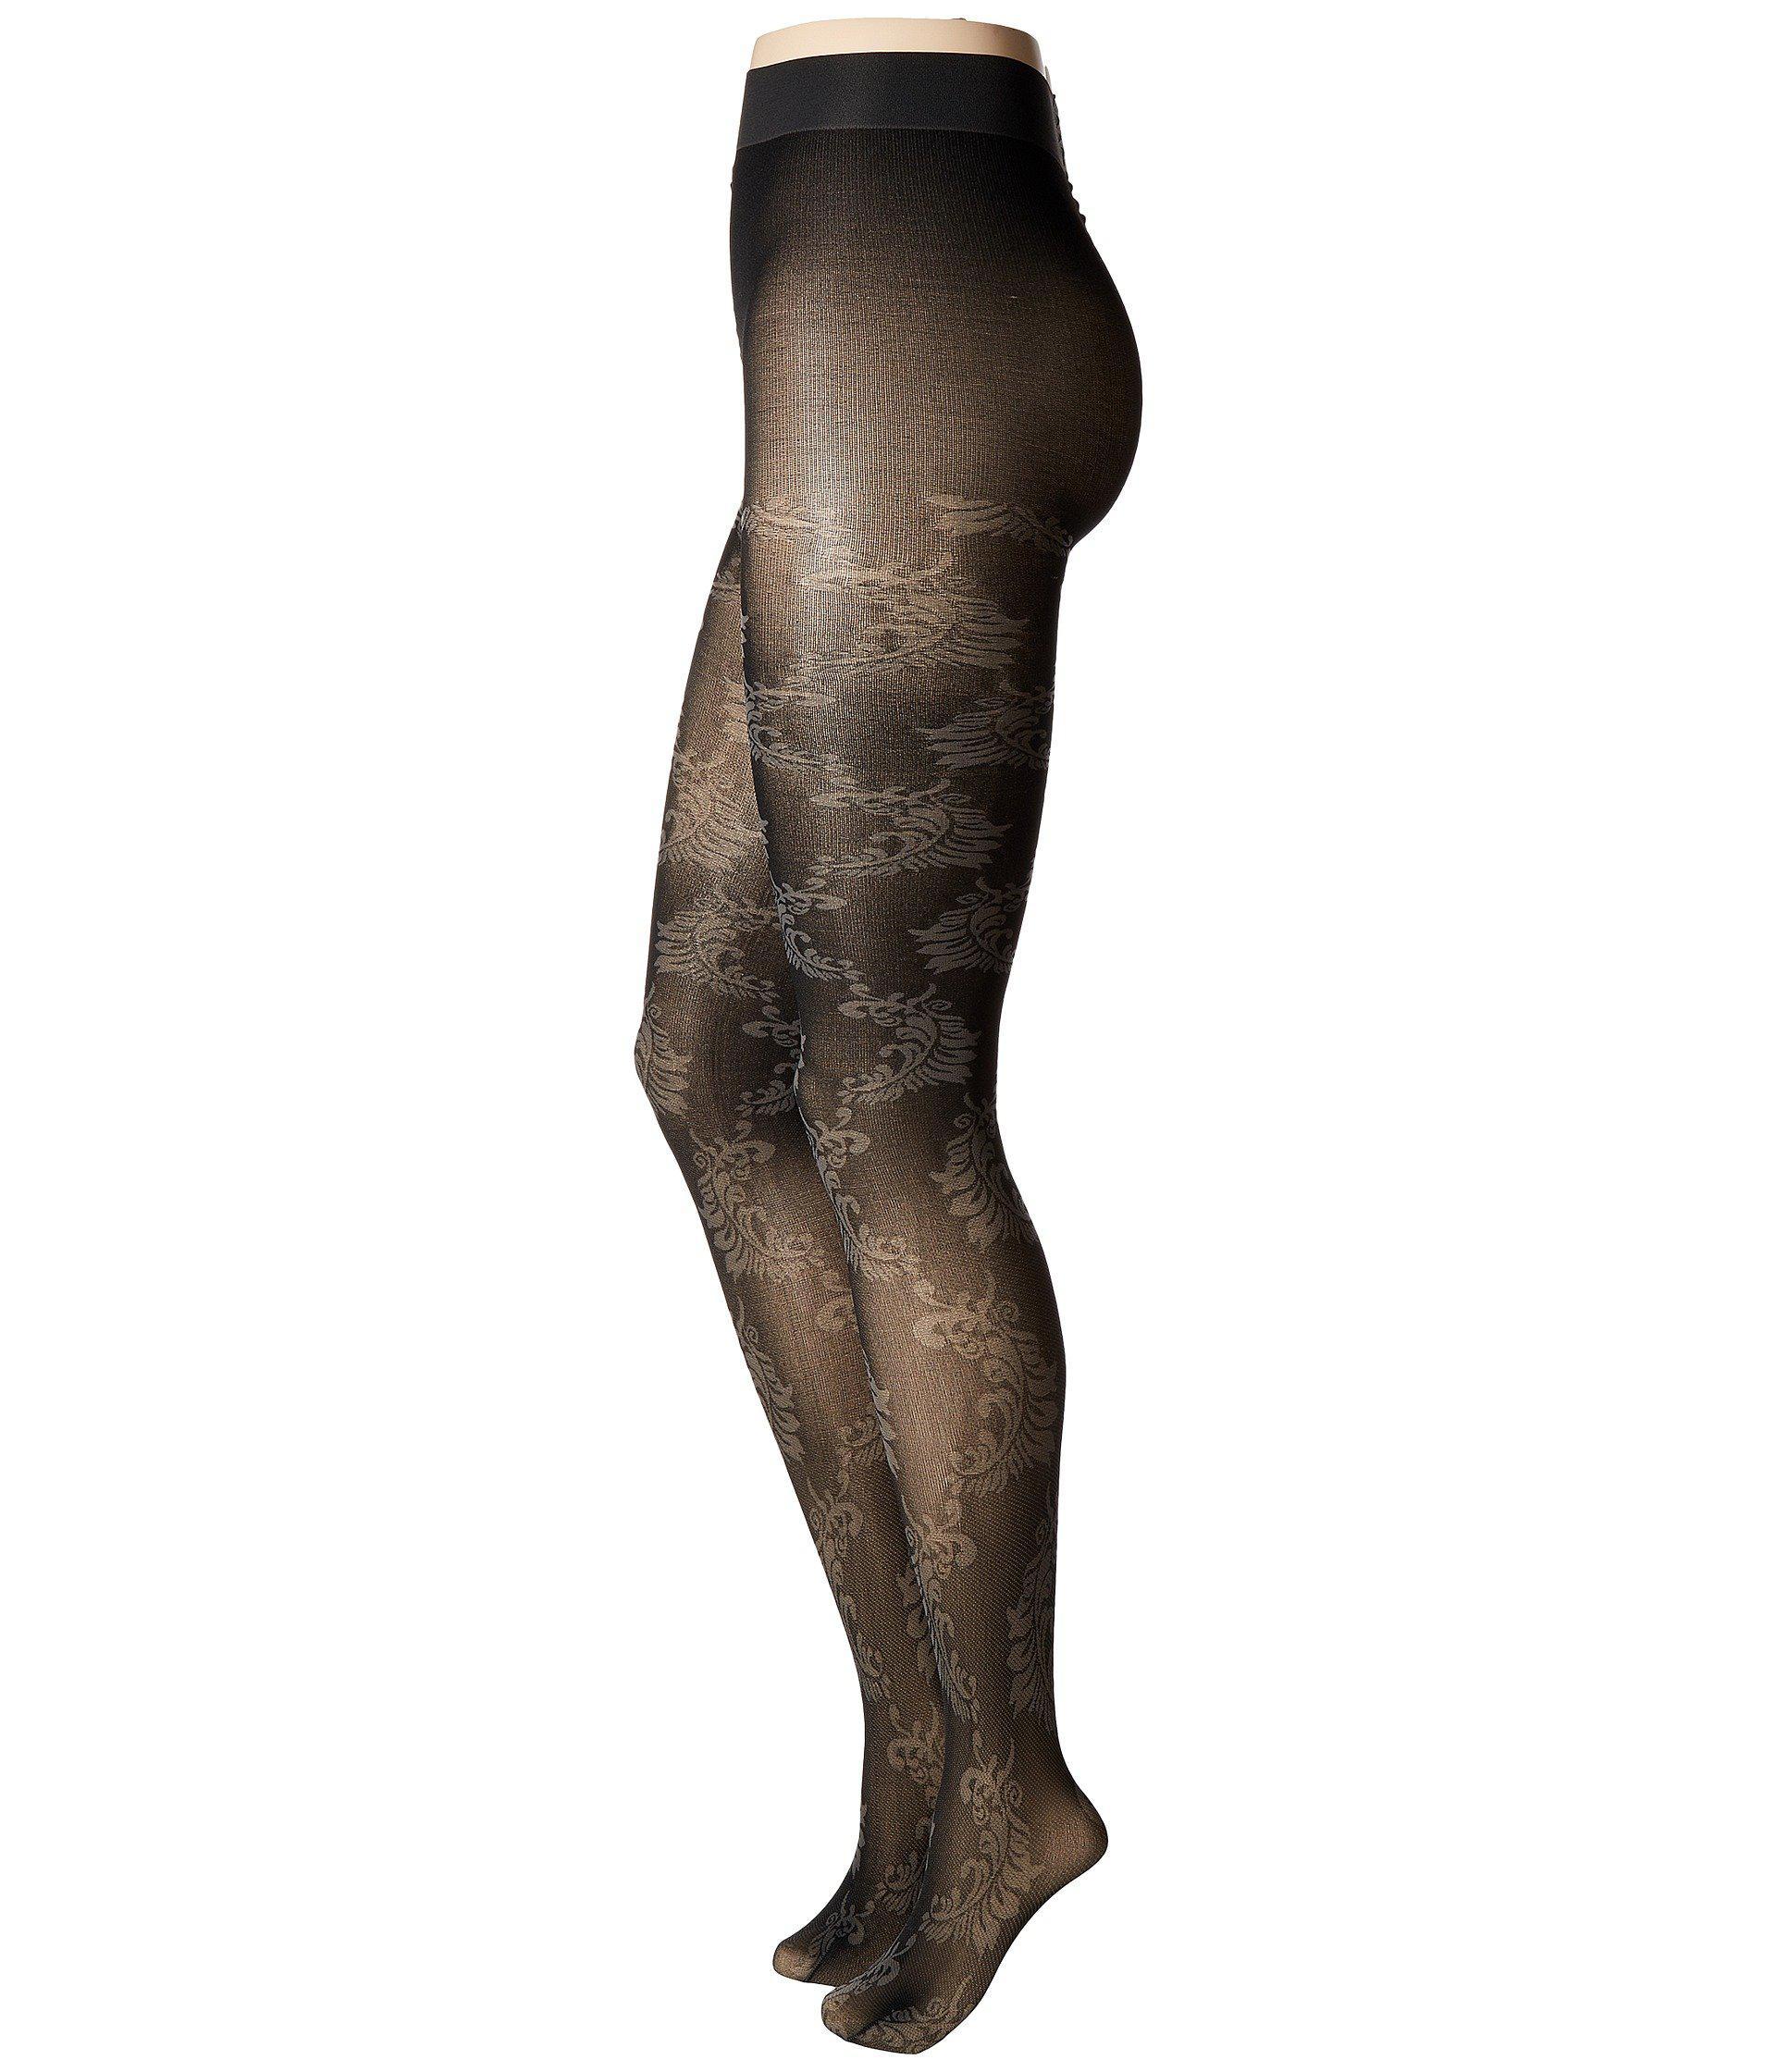 5abde9204de50 Lyst - Natori Feathers Opaque Tights (black) Hose in Black